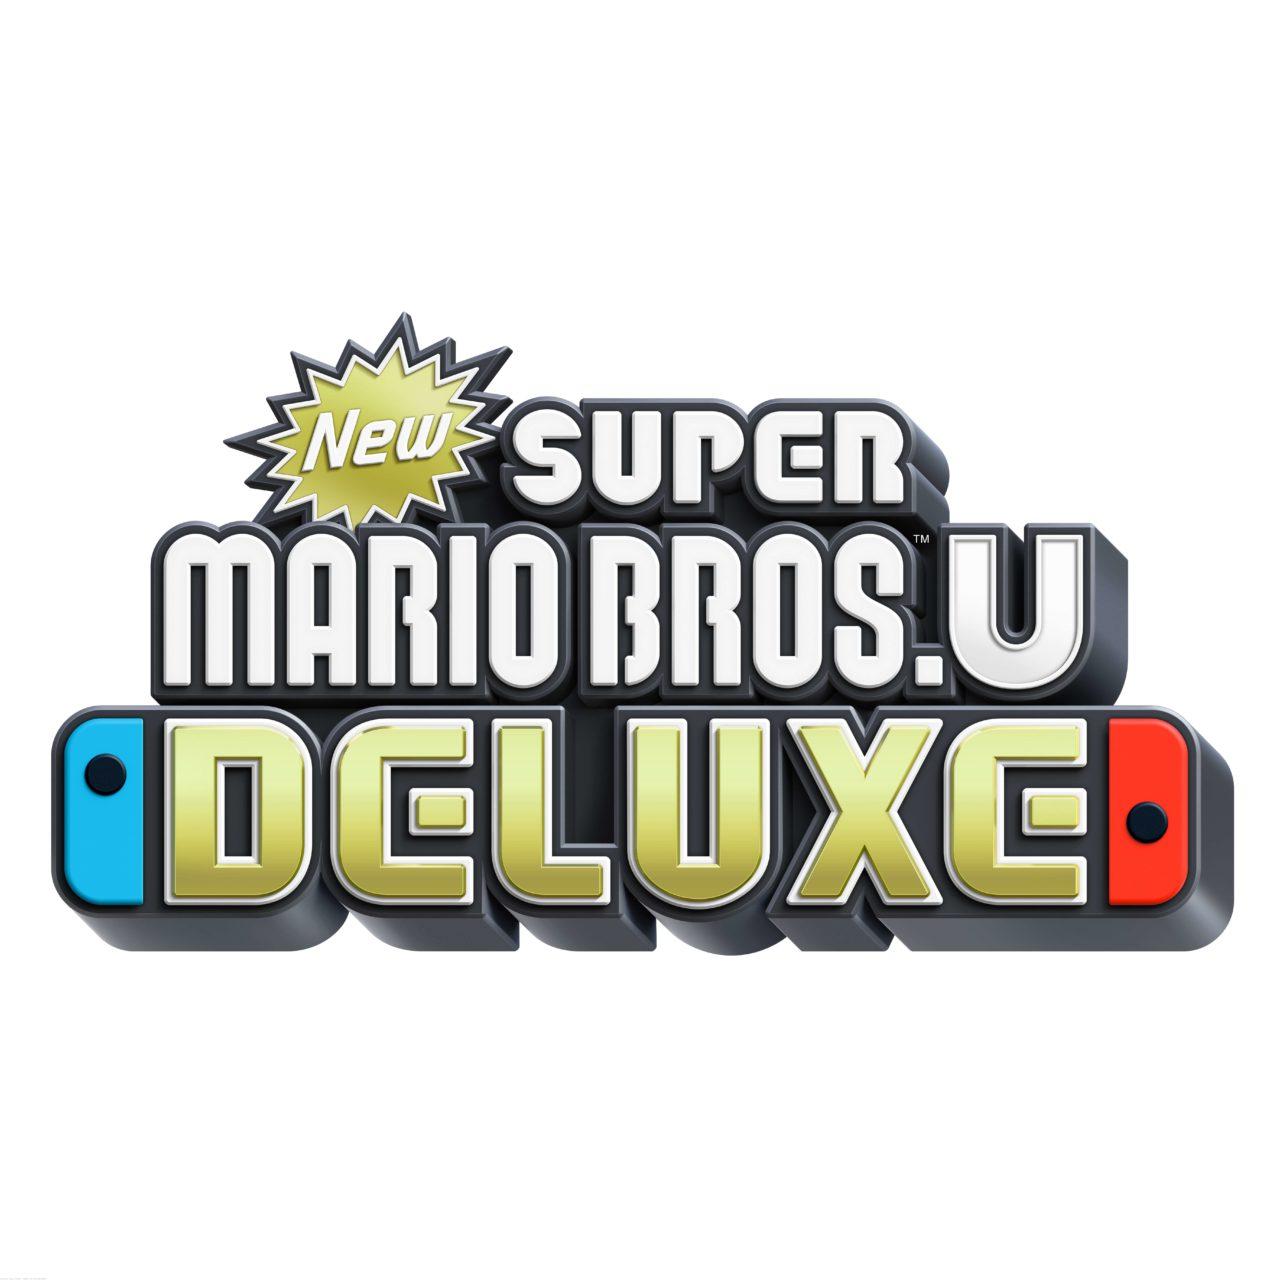 New Super Mario Bros U Deluxe Announced For Switch Pure Nintendo